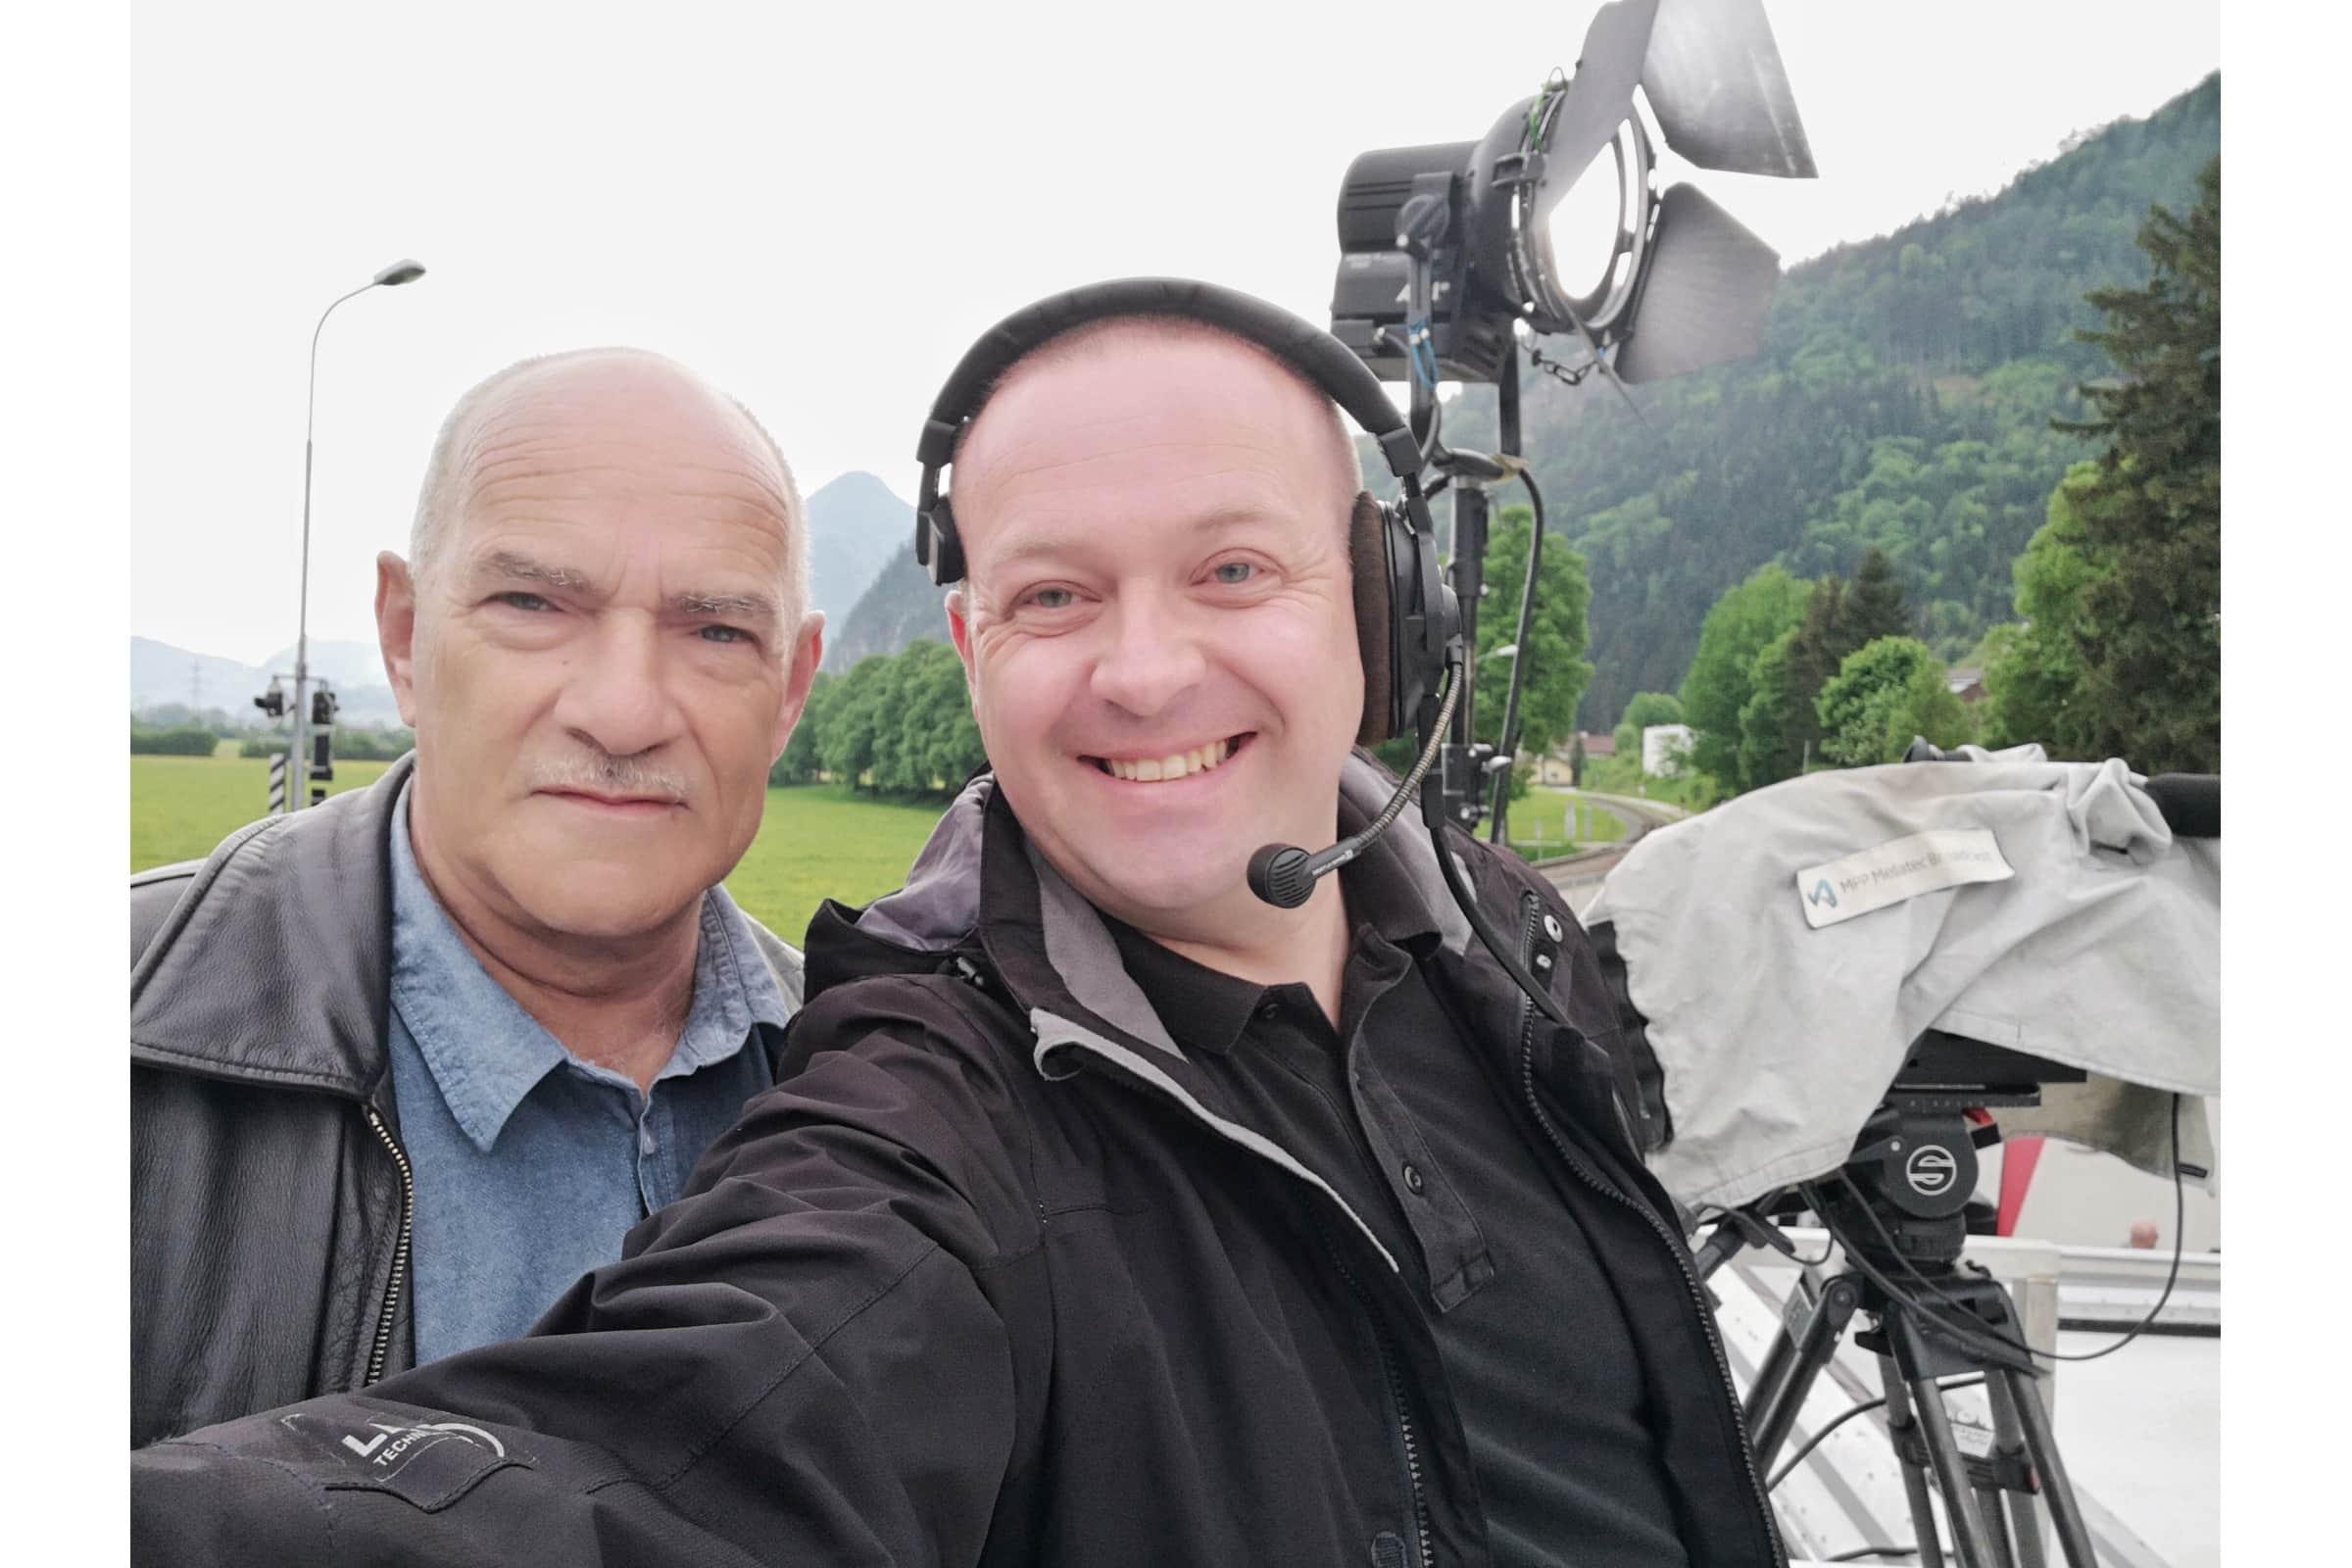 andreas felder kameramann orf unterwegs in österreich 02 02.05.2018 09 02 48 - ORF Unterwegs in Österreich - Tirol